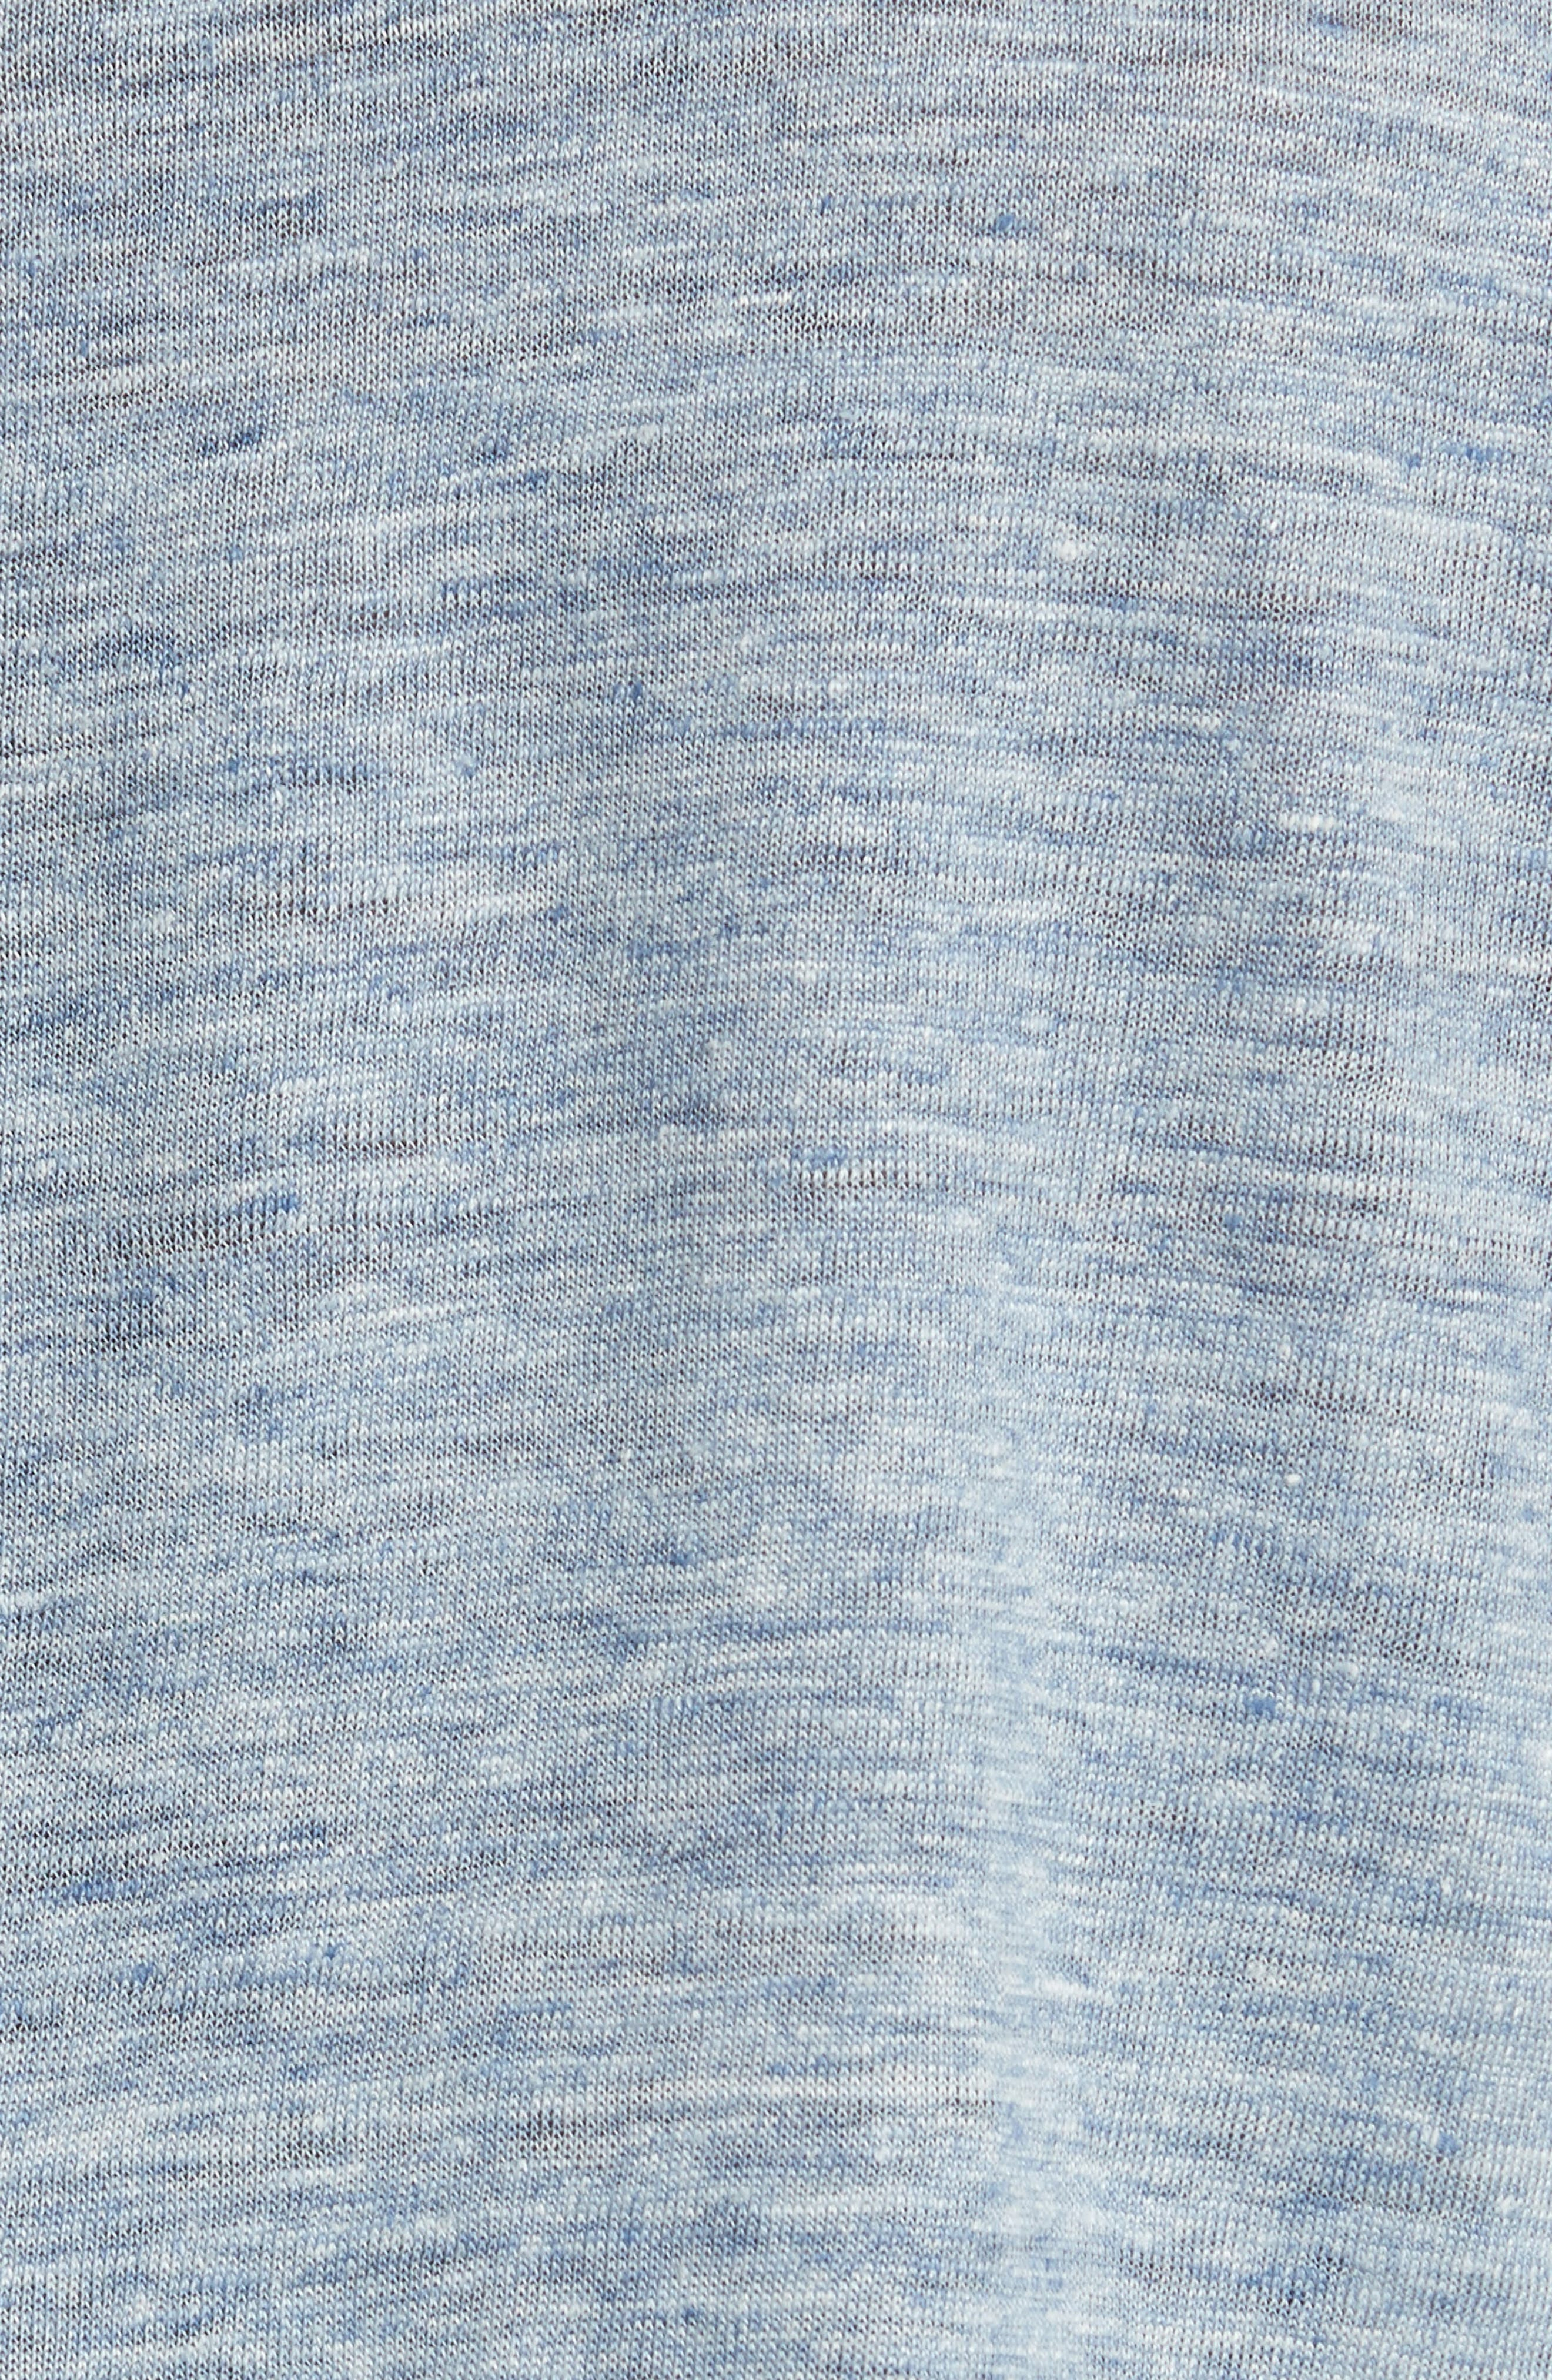 Owen Linen Long Sleeve T-Shirt,                             Alternate thumbnail 5, color,                             Blue